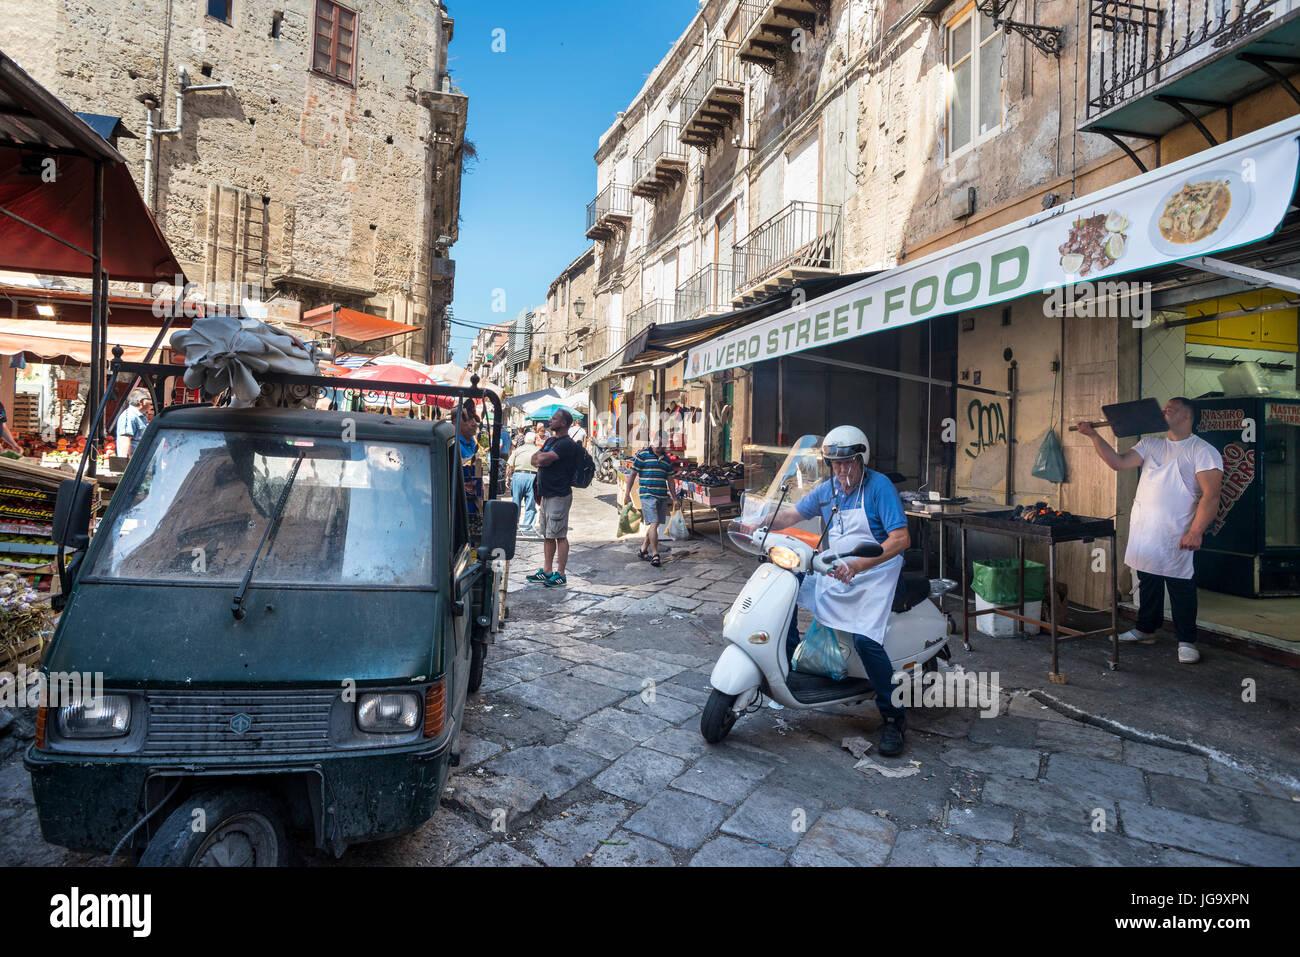 Street scene in The Ballaro Market in the Albergheria district of central Palermo, Sicily, Italy. - Stock Image